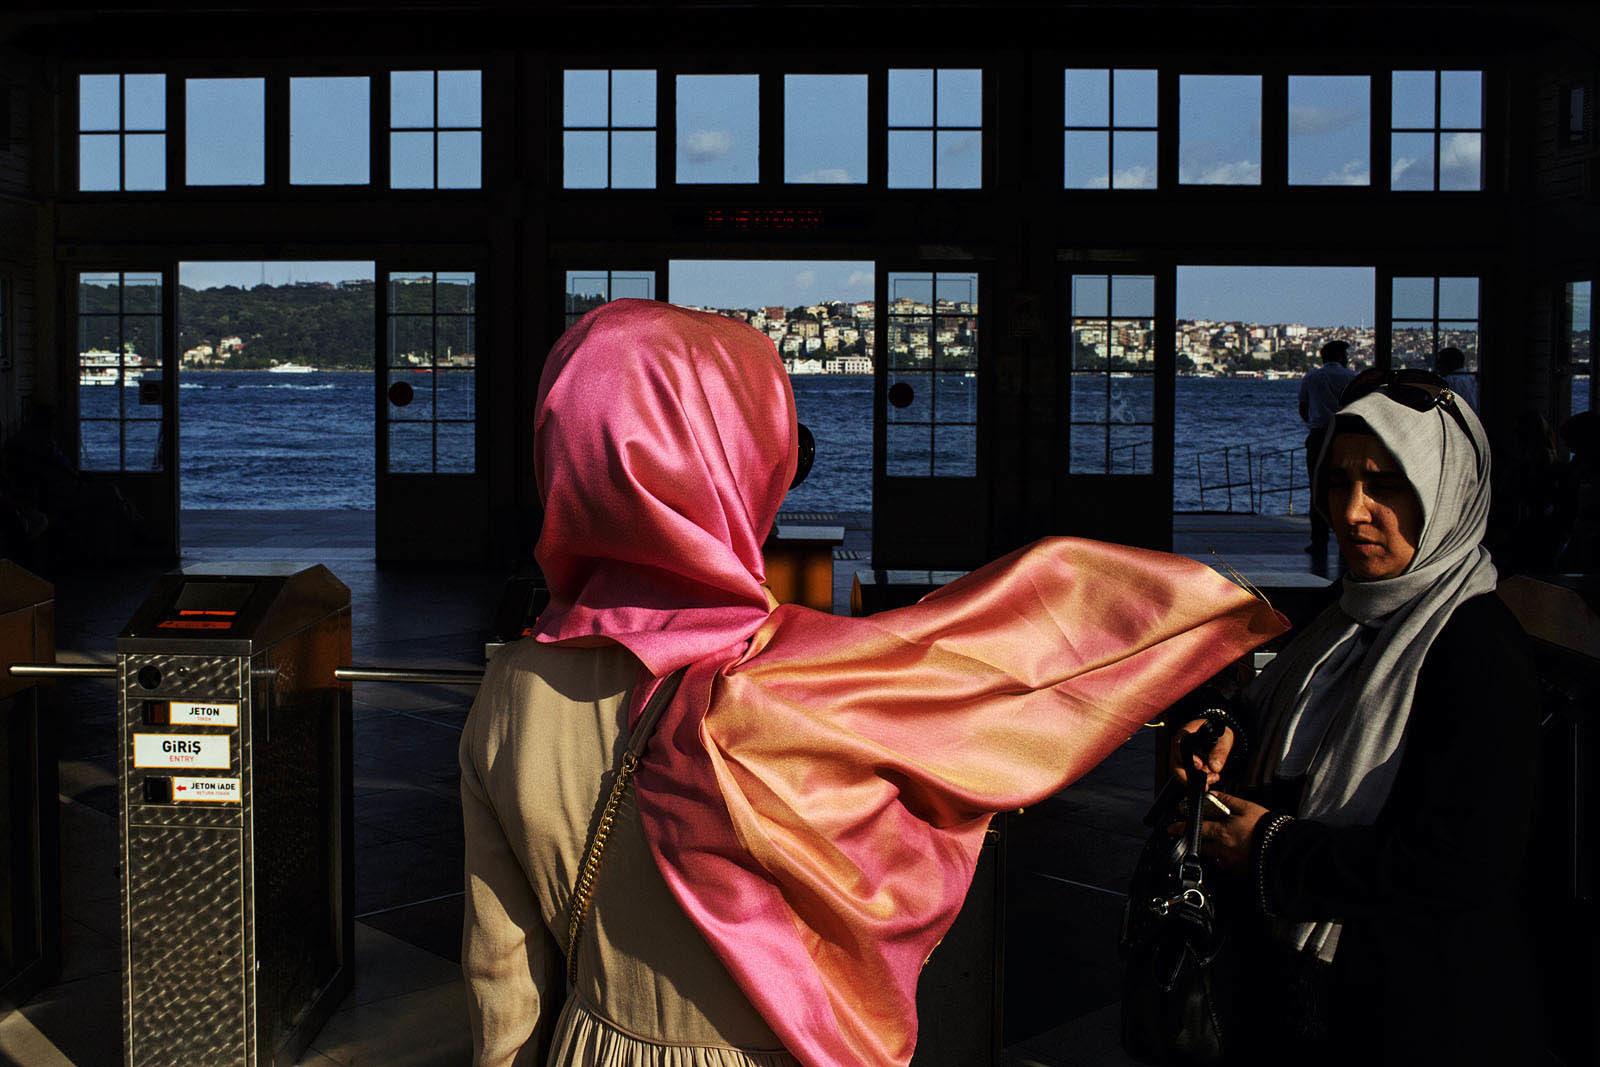 turkey_istanbul_besiktas_ferry_terminal_pier_woman_headscarf_islam_muslim-1600x1067.jpg